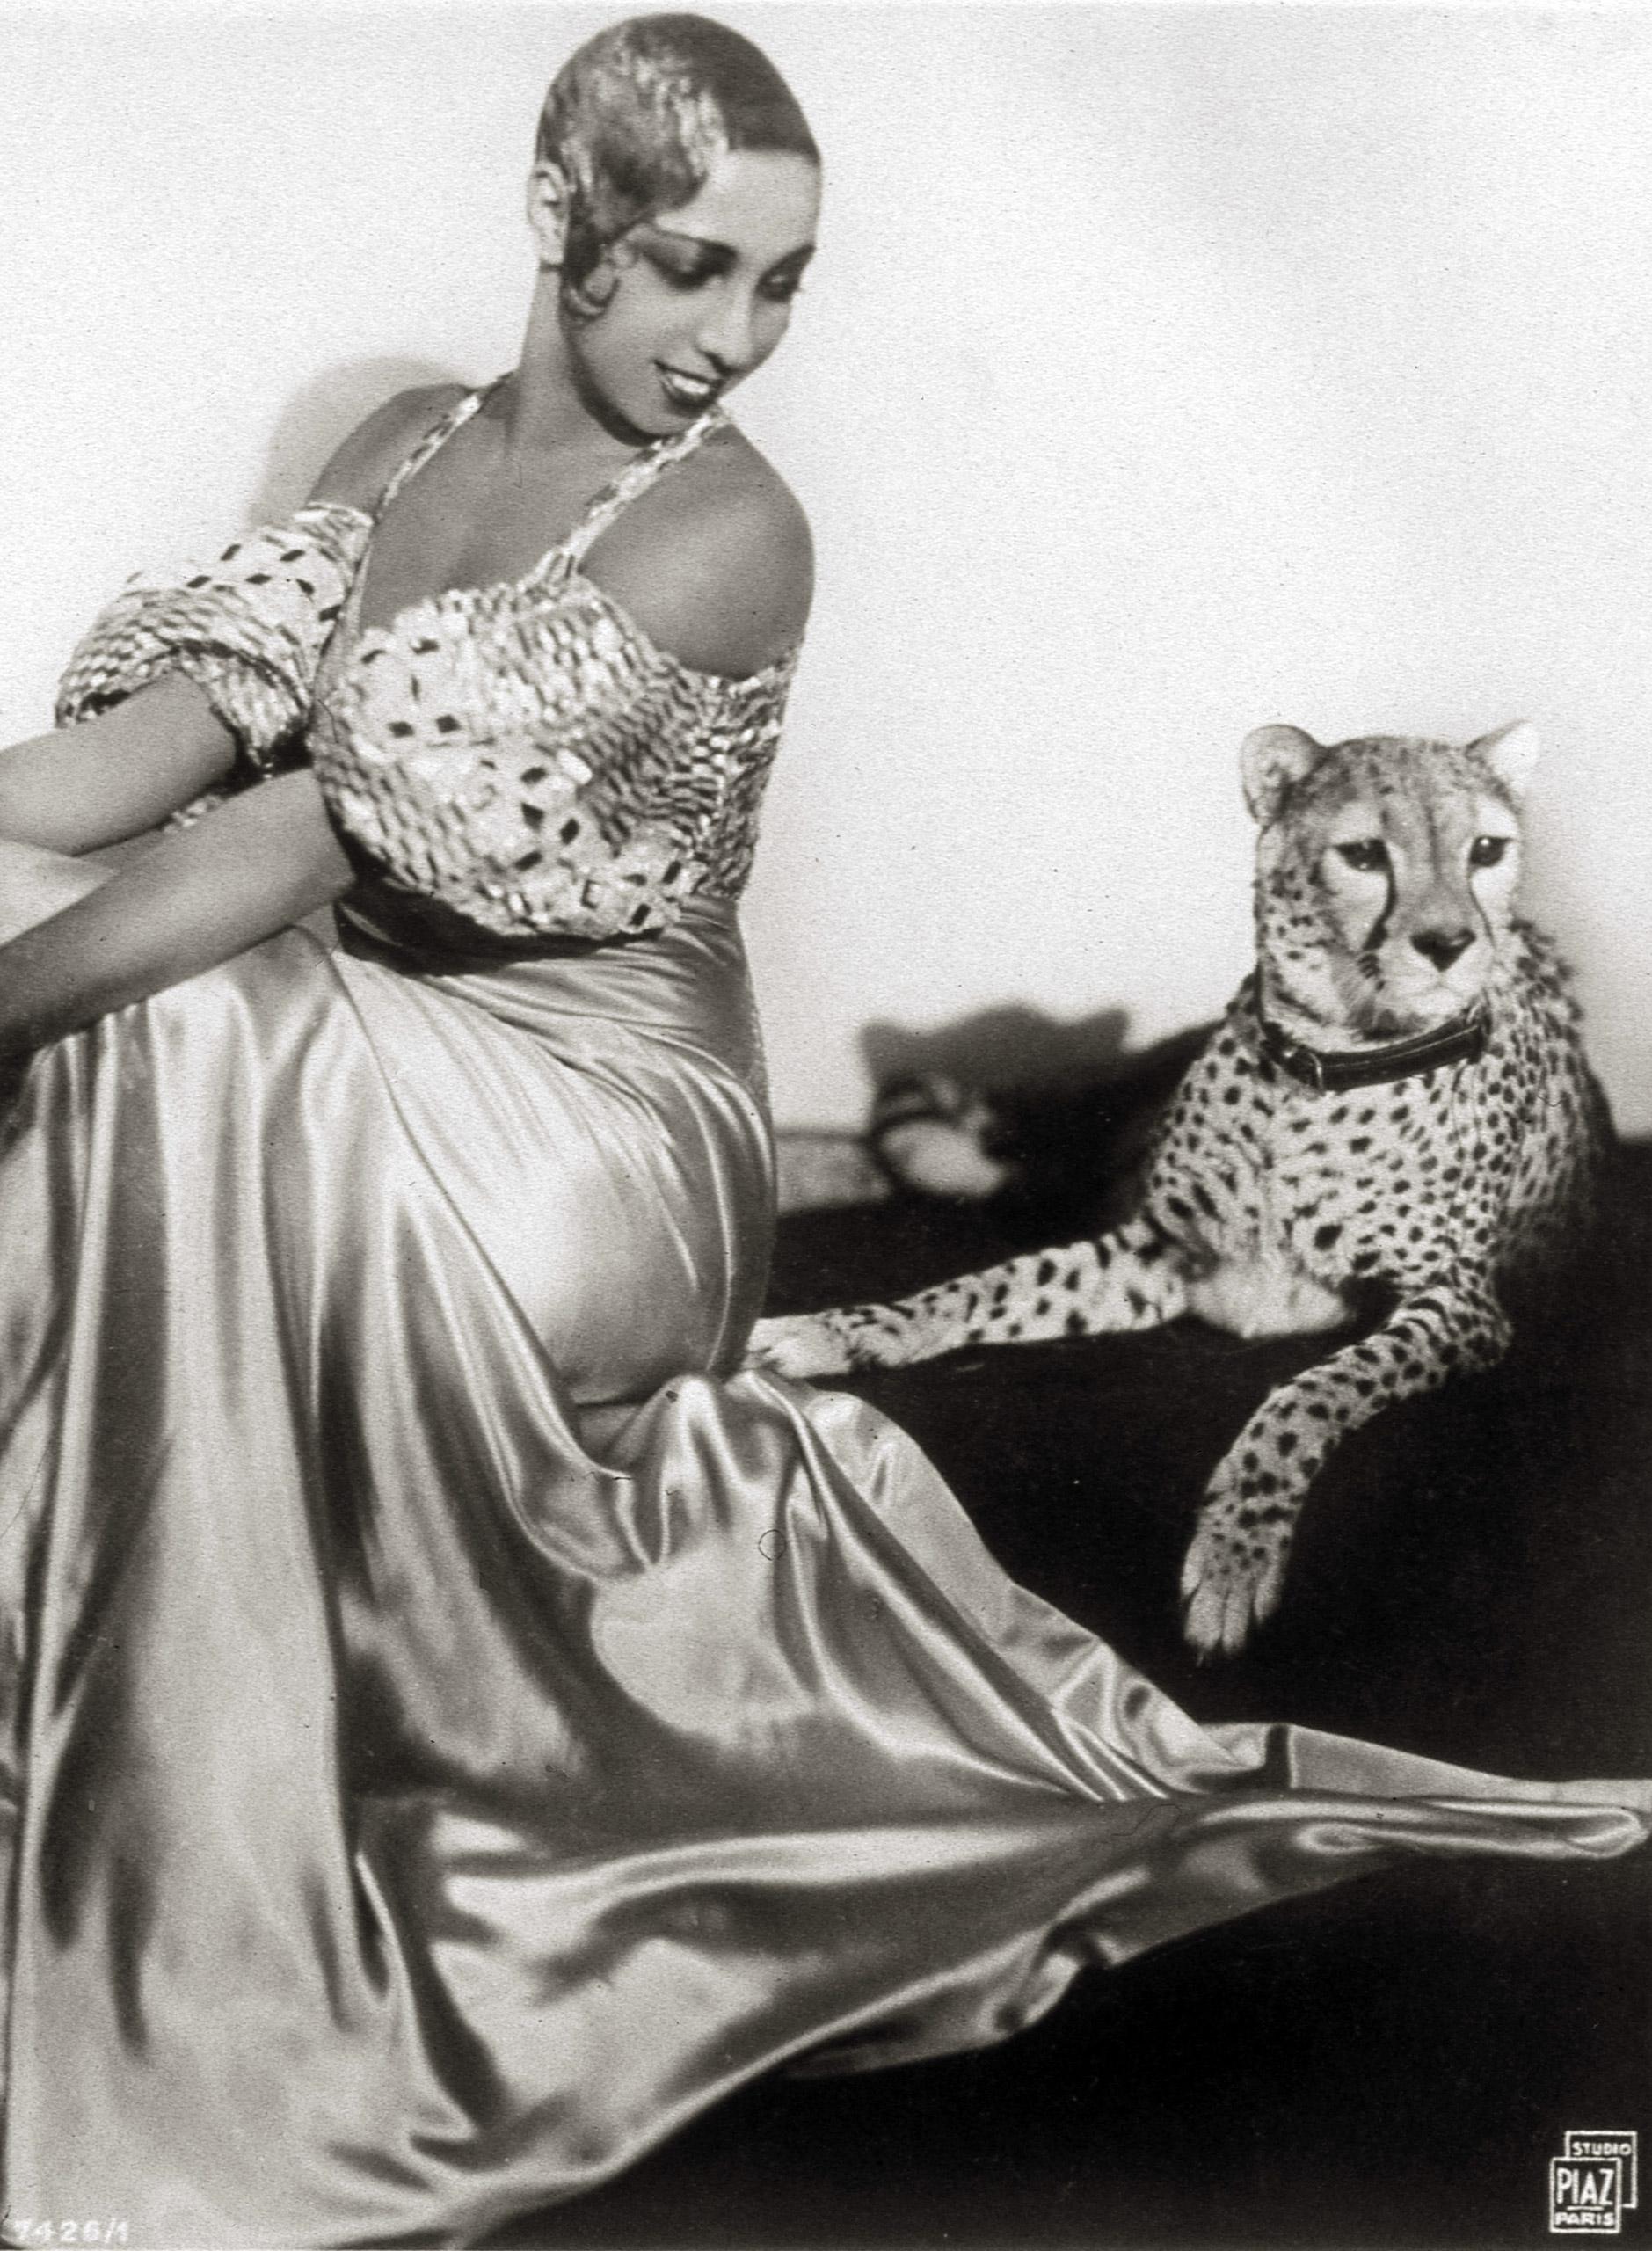 Josephine Baker sits with her pet cheetah, Chiquita, 1931.